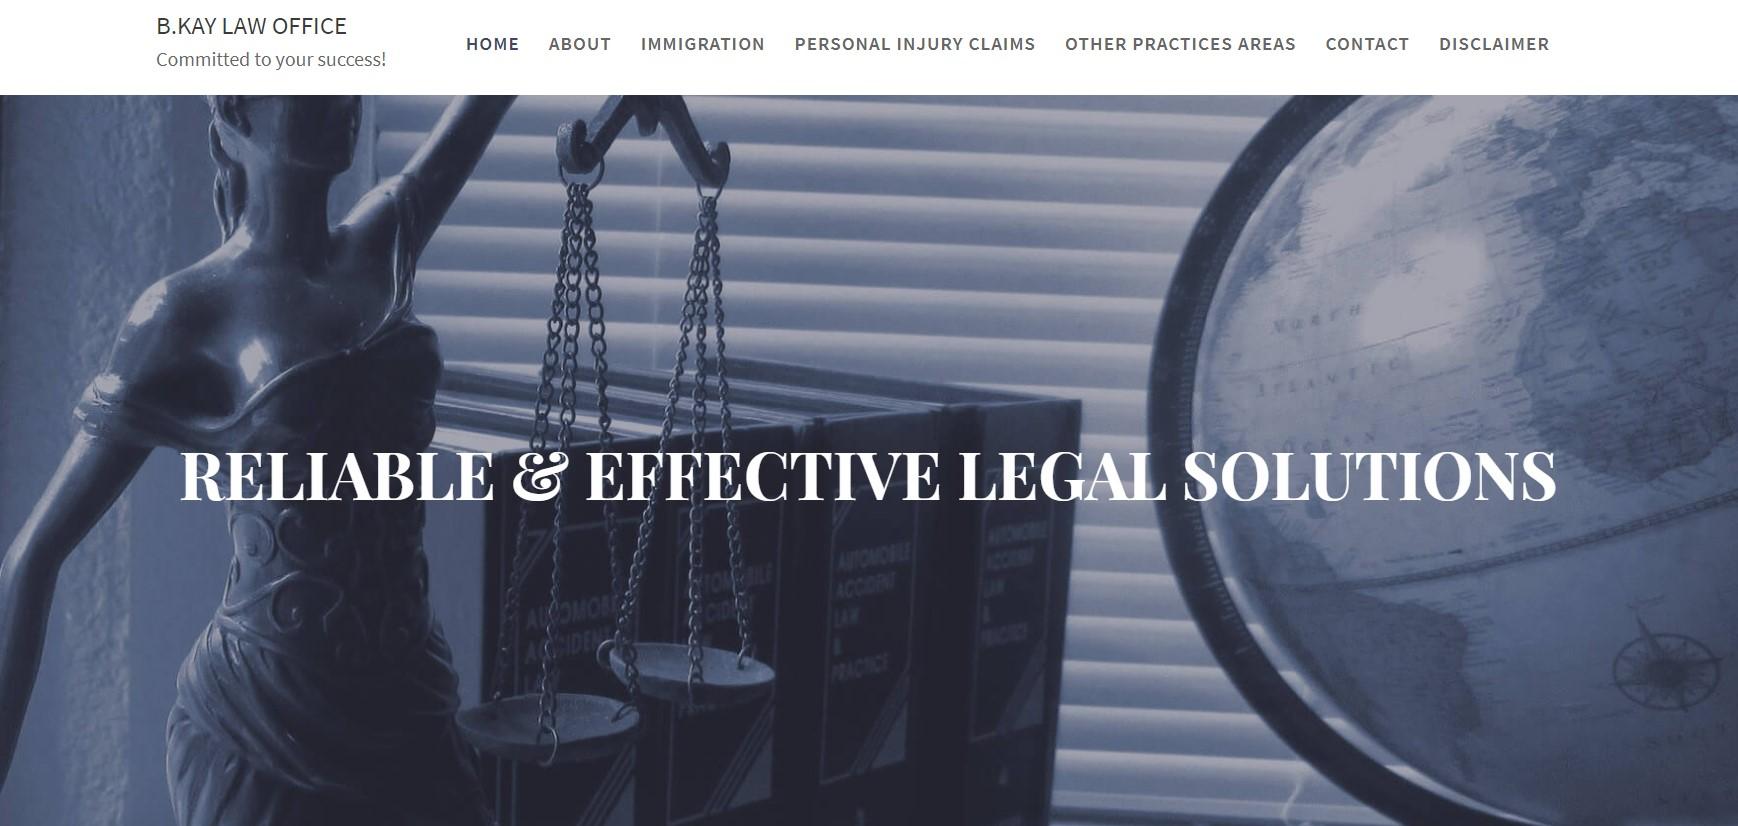 b.kay immigration attorney in edmonton